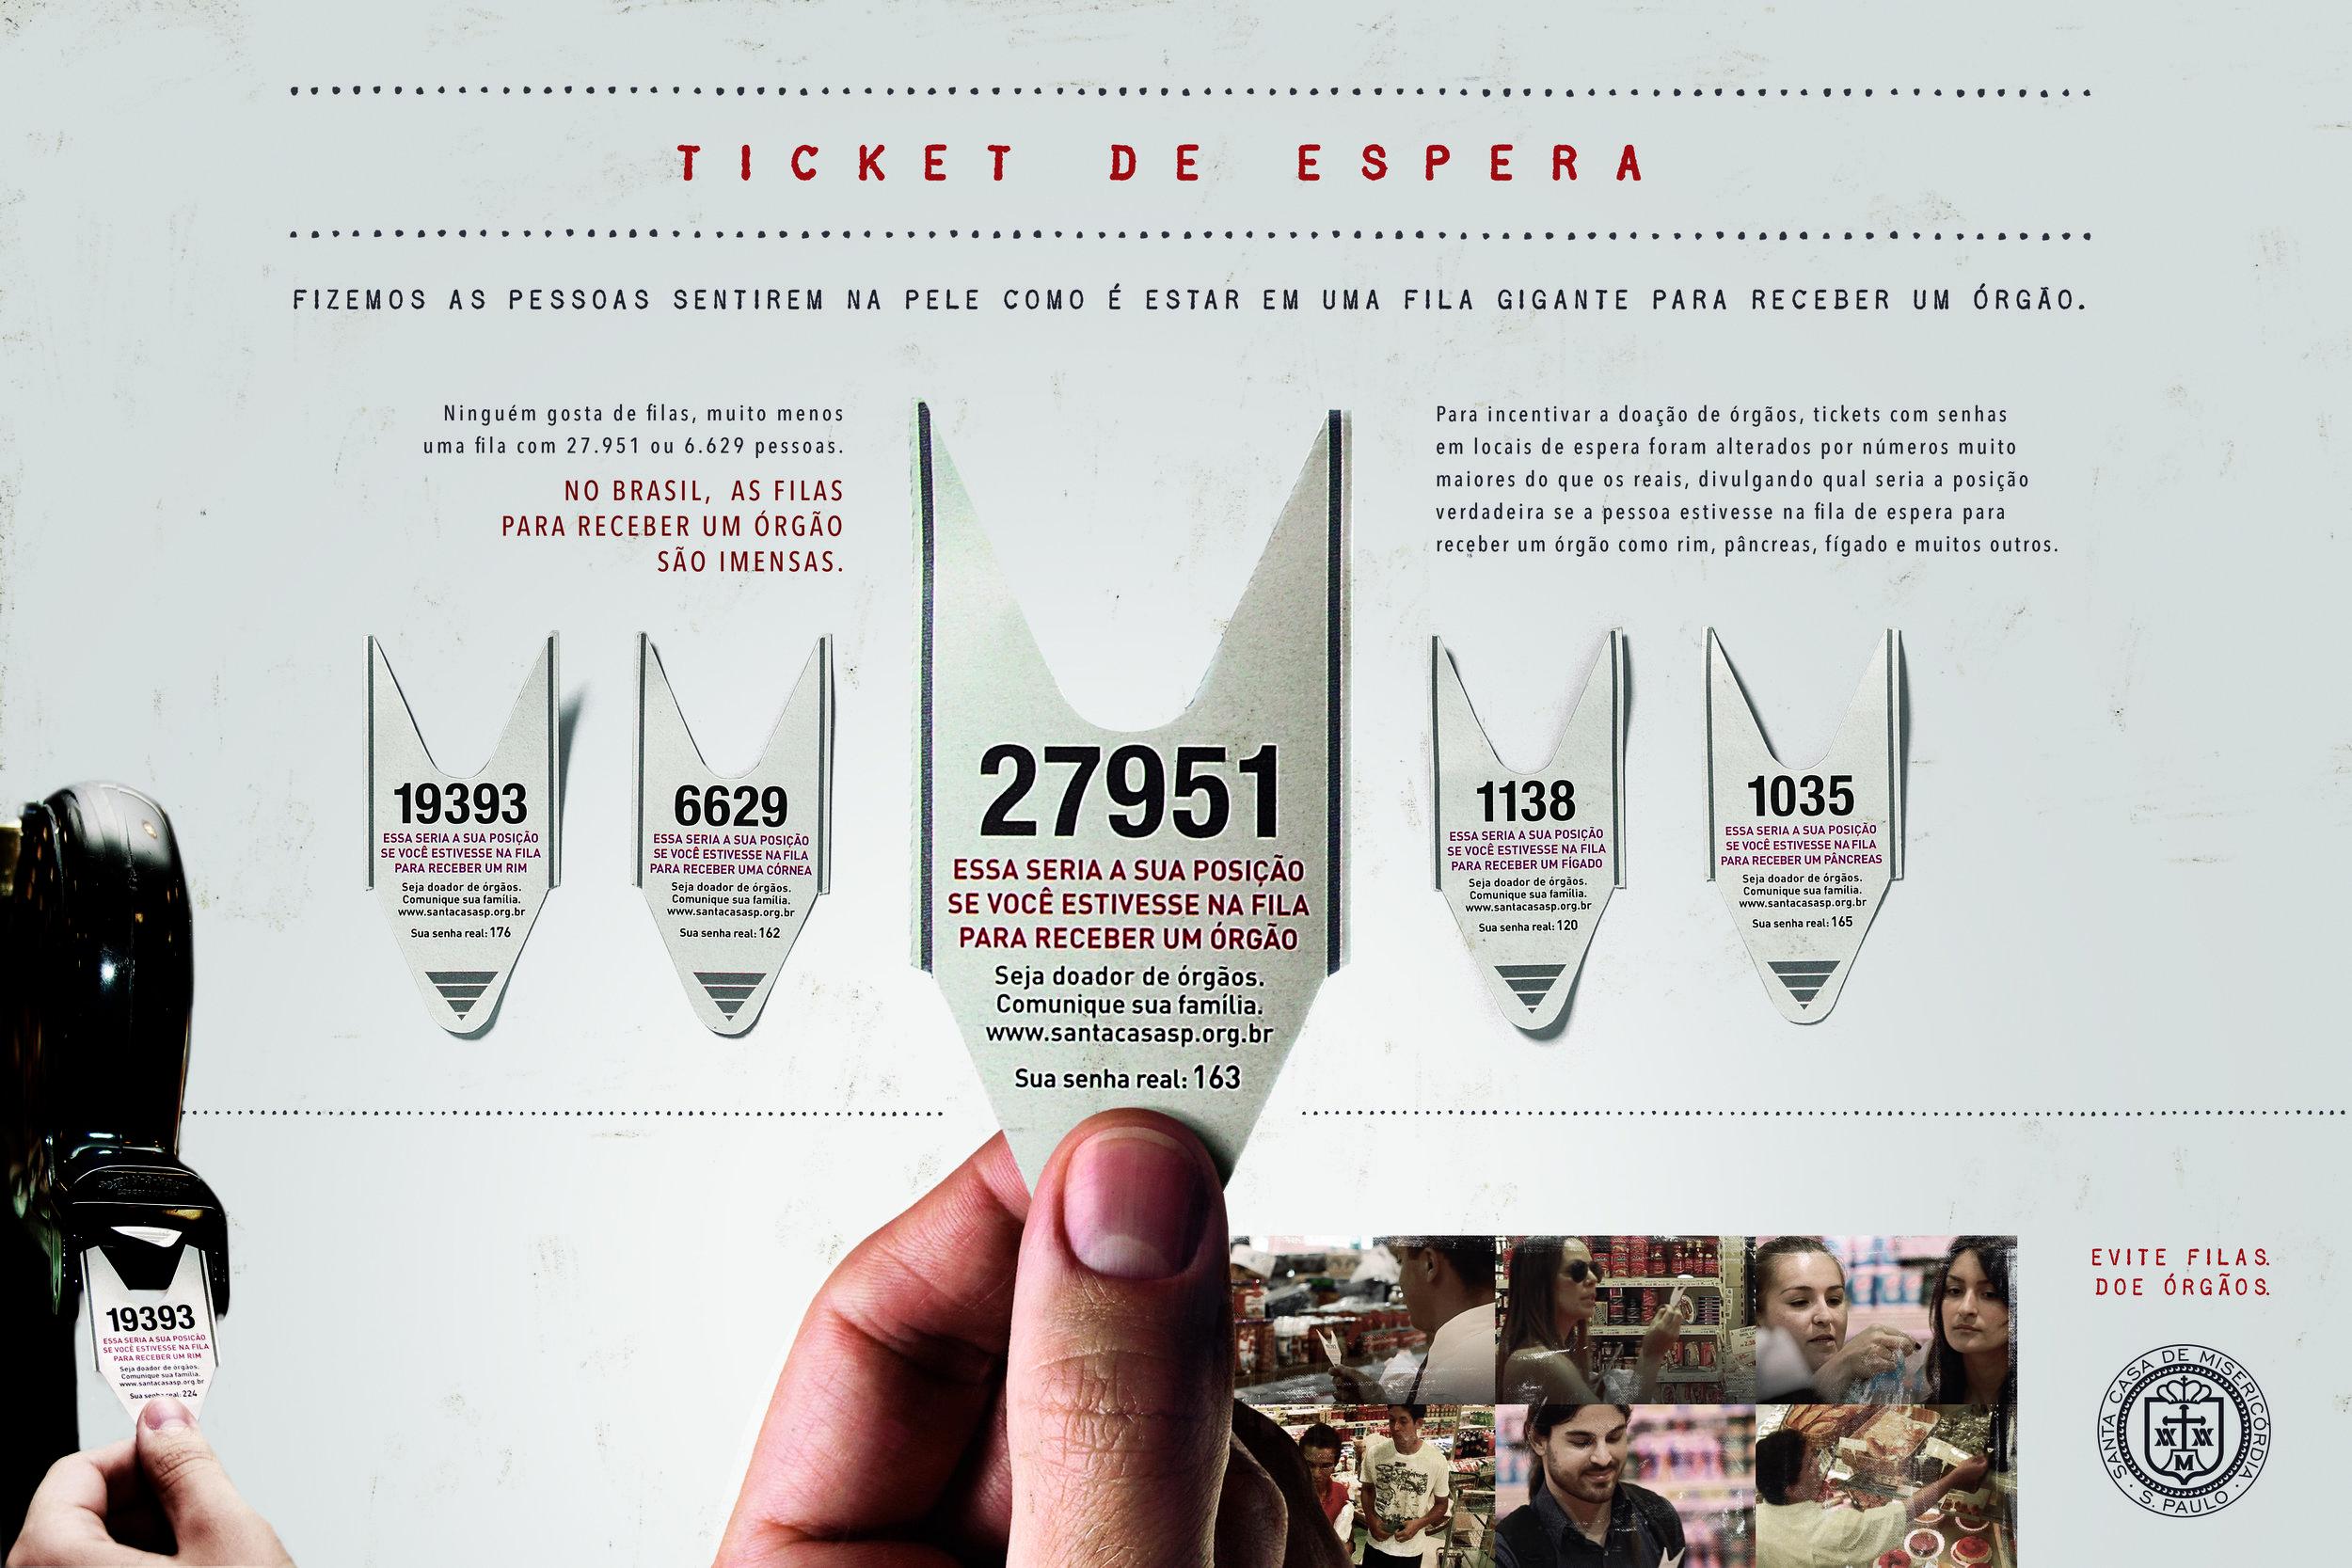 ticket_de_espera.jpg